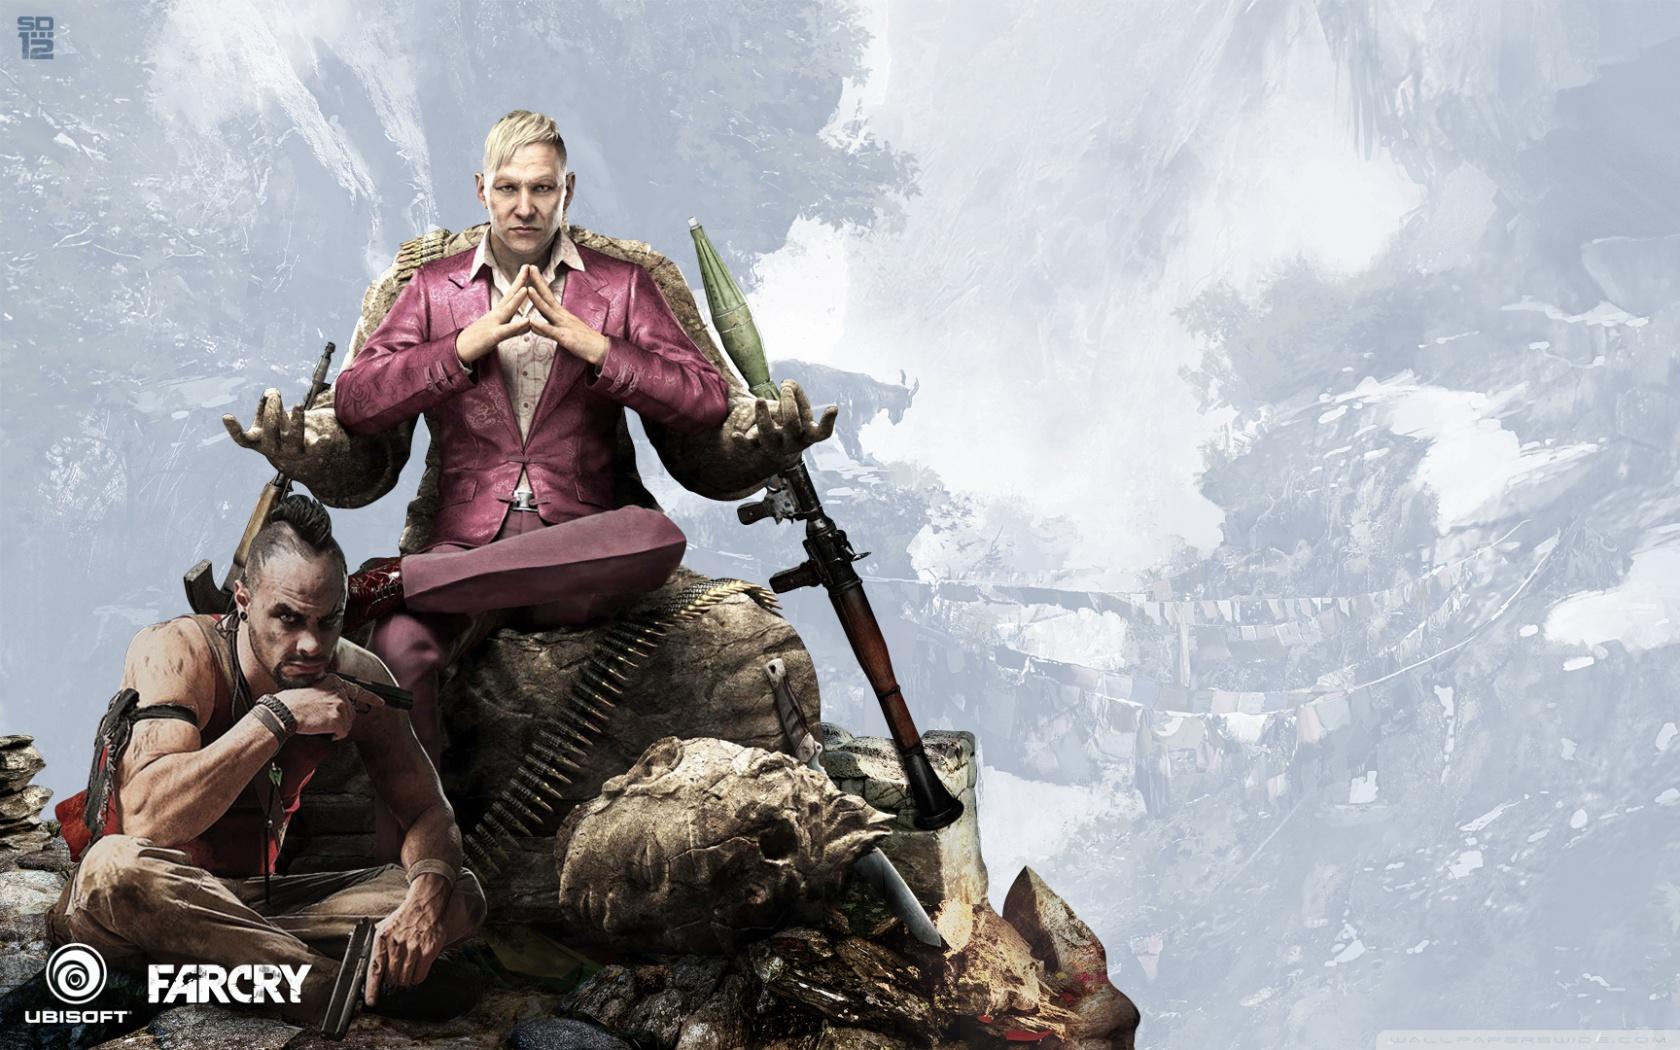 Wallpaper Video Games Far Cry 4 Pagan Min Vaas Montenegro